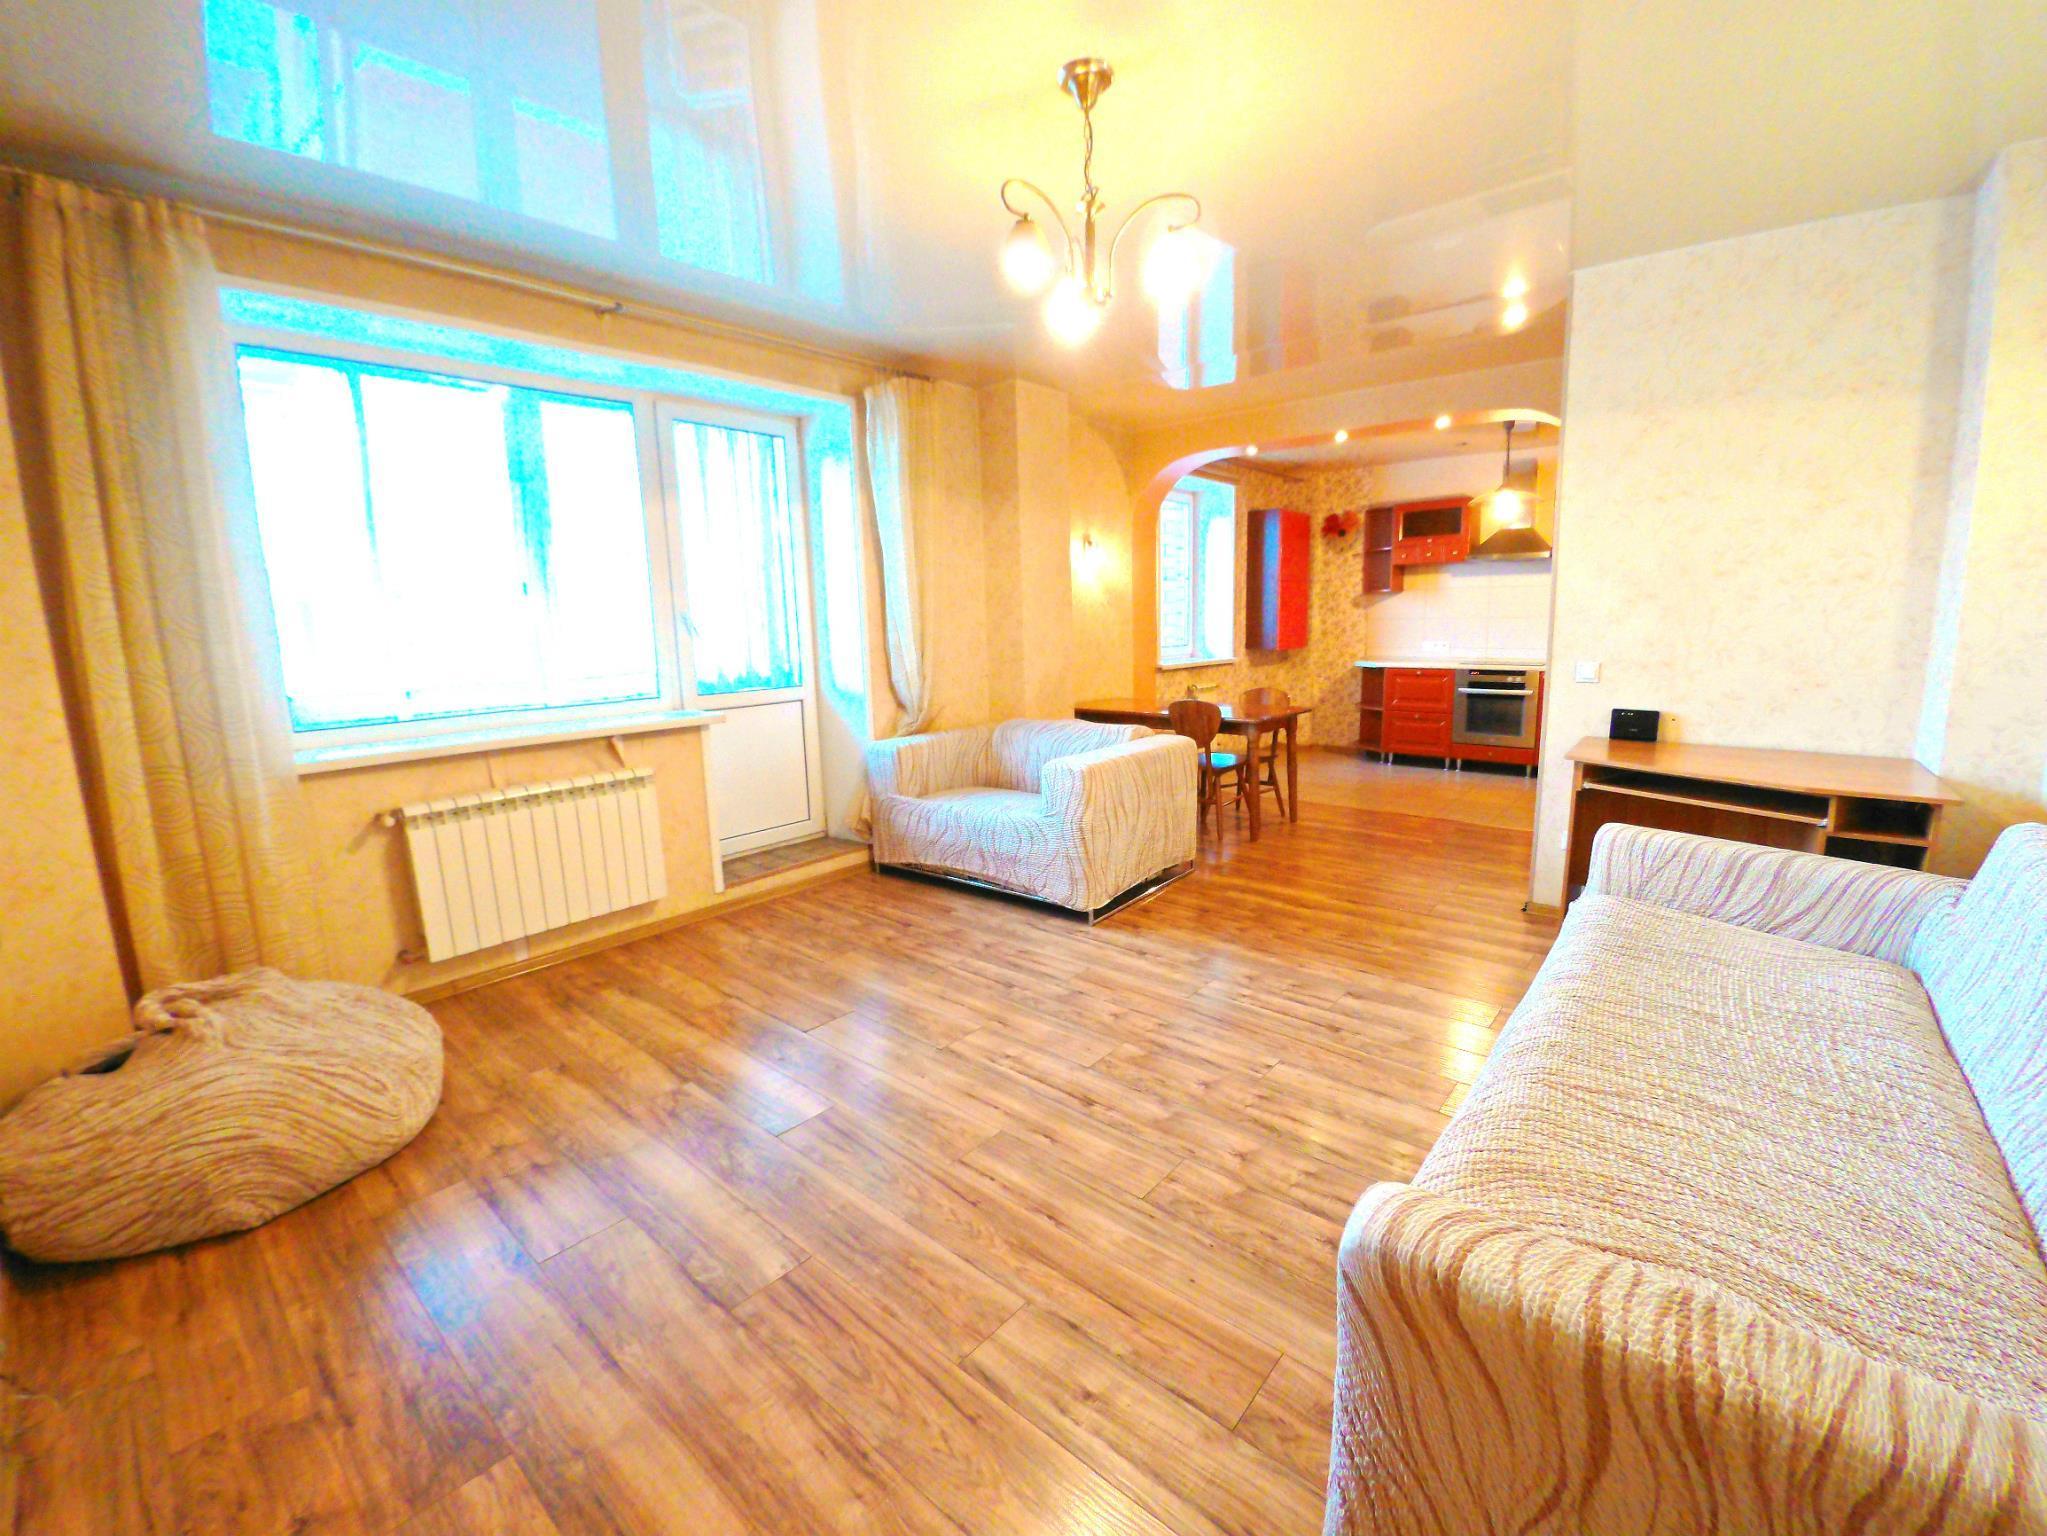 Apartments In Baykal'skaya 293 5 Irkutsk